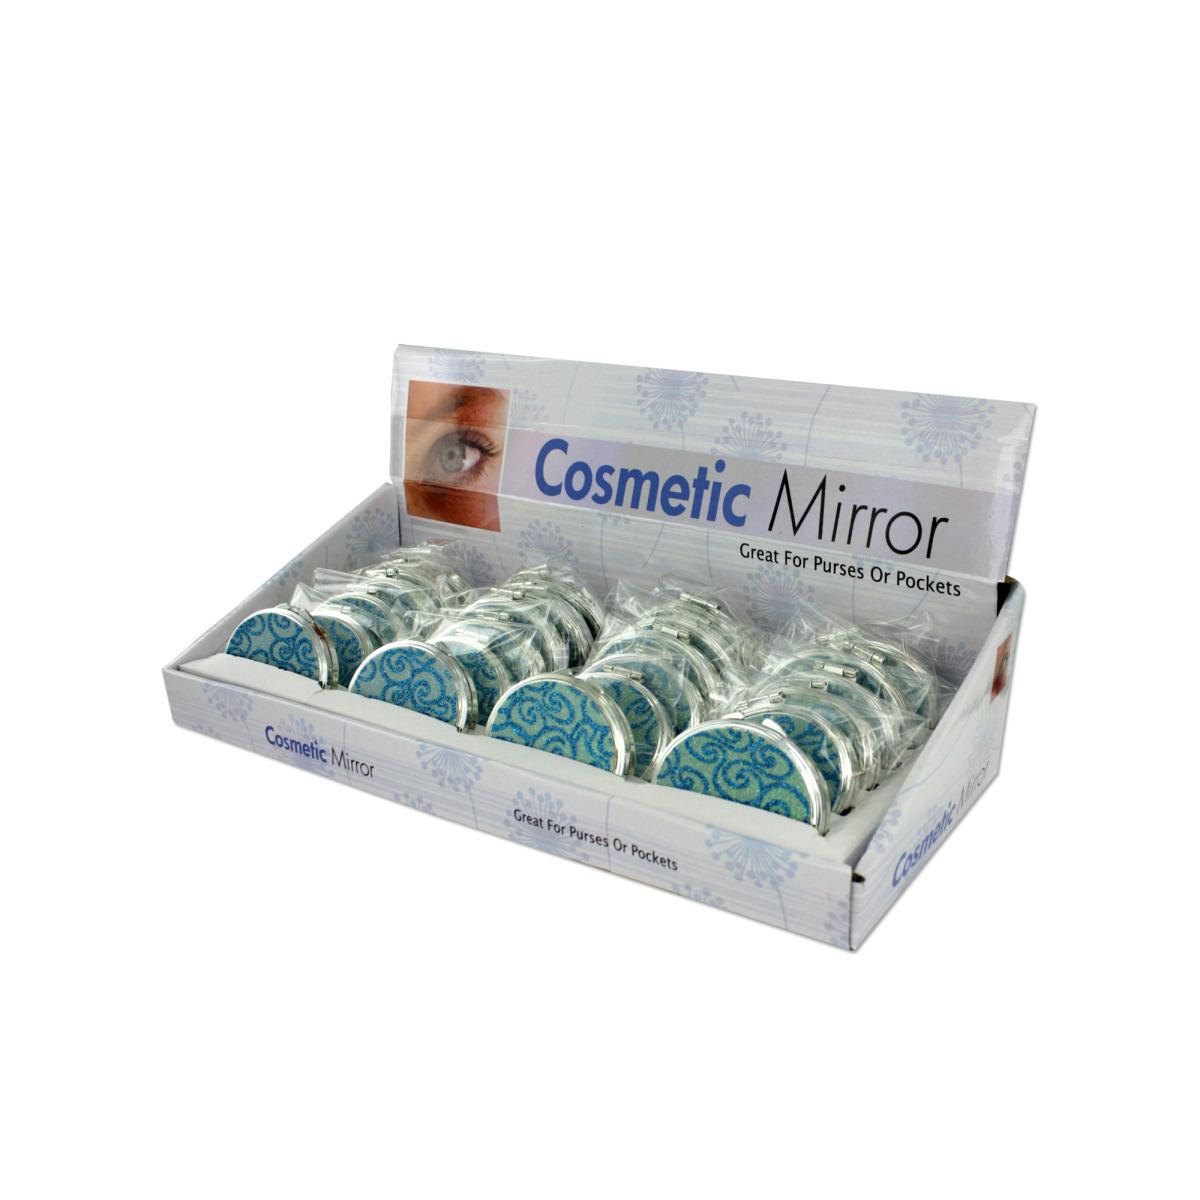 Glittering COMPACT MIRROR Countertop Display [914752]